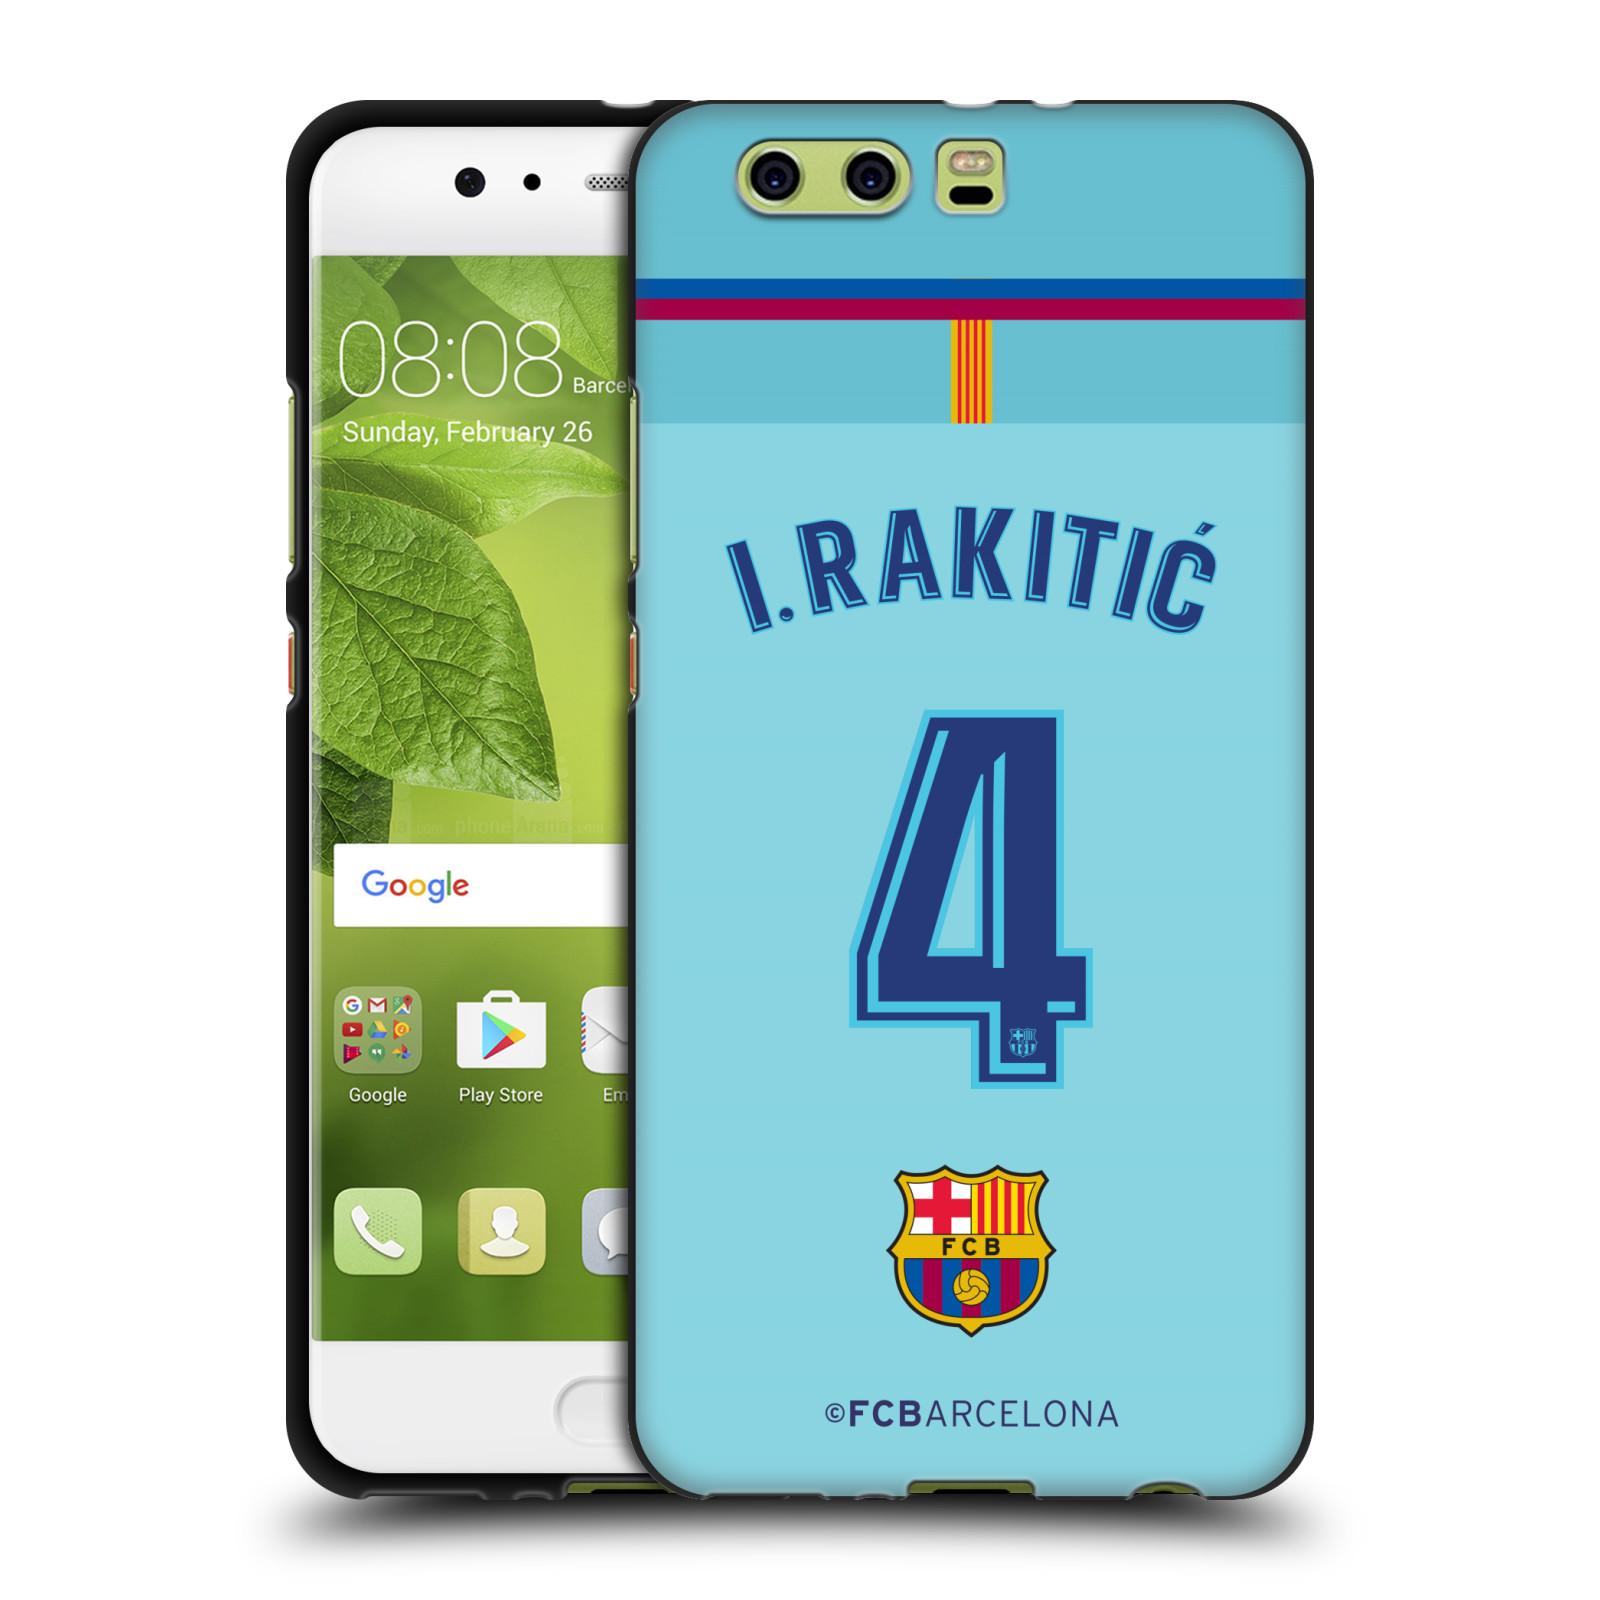 OFFICIAL-FC-BARCELONA-2017-18-AWAY-KIT-1-BLACK-SOFT-GEL-CASE-FOR-HUAWEI-PHONES